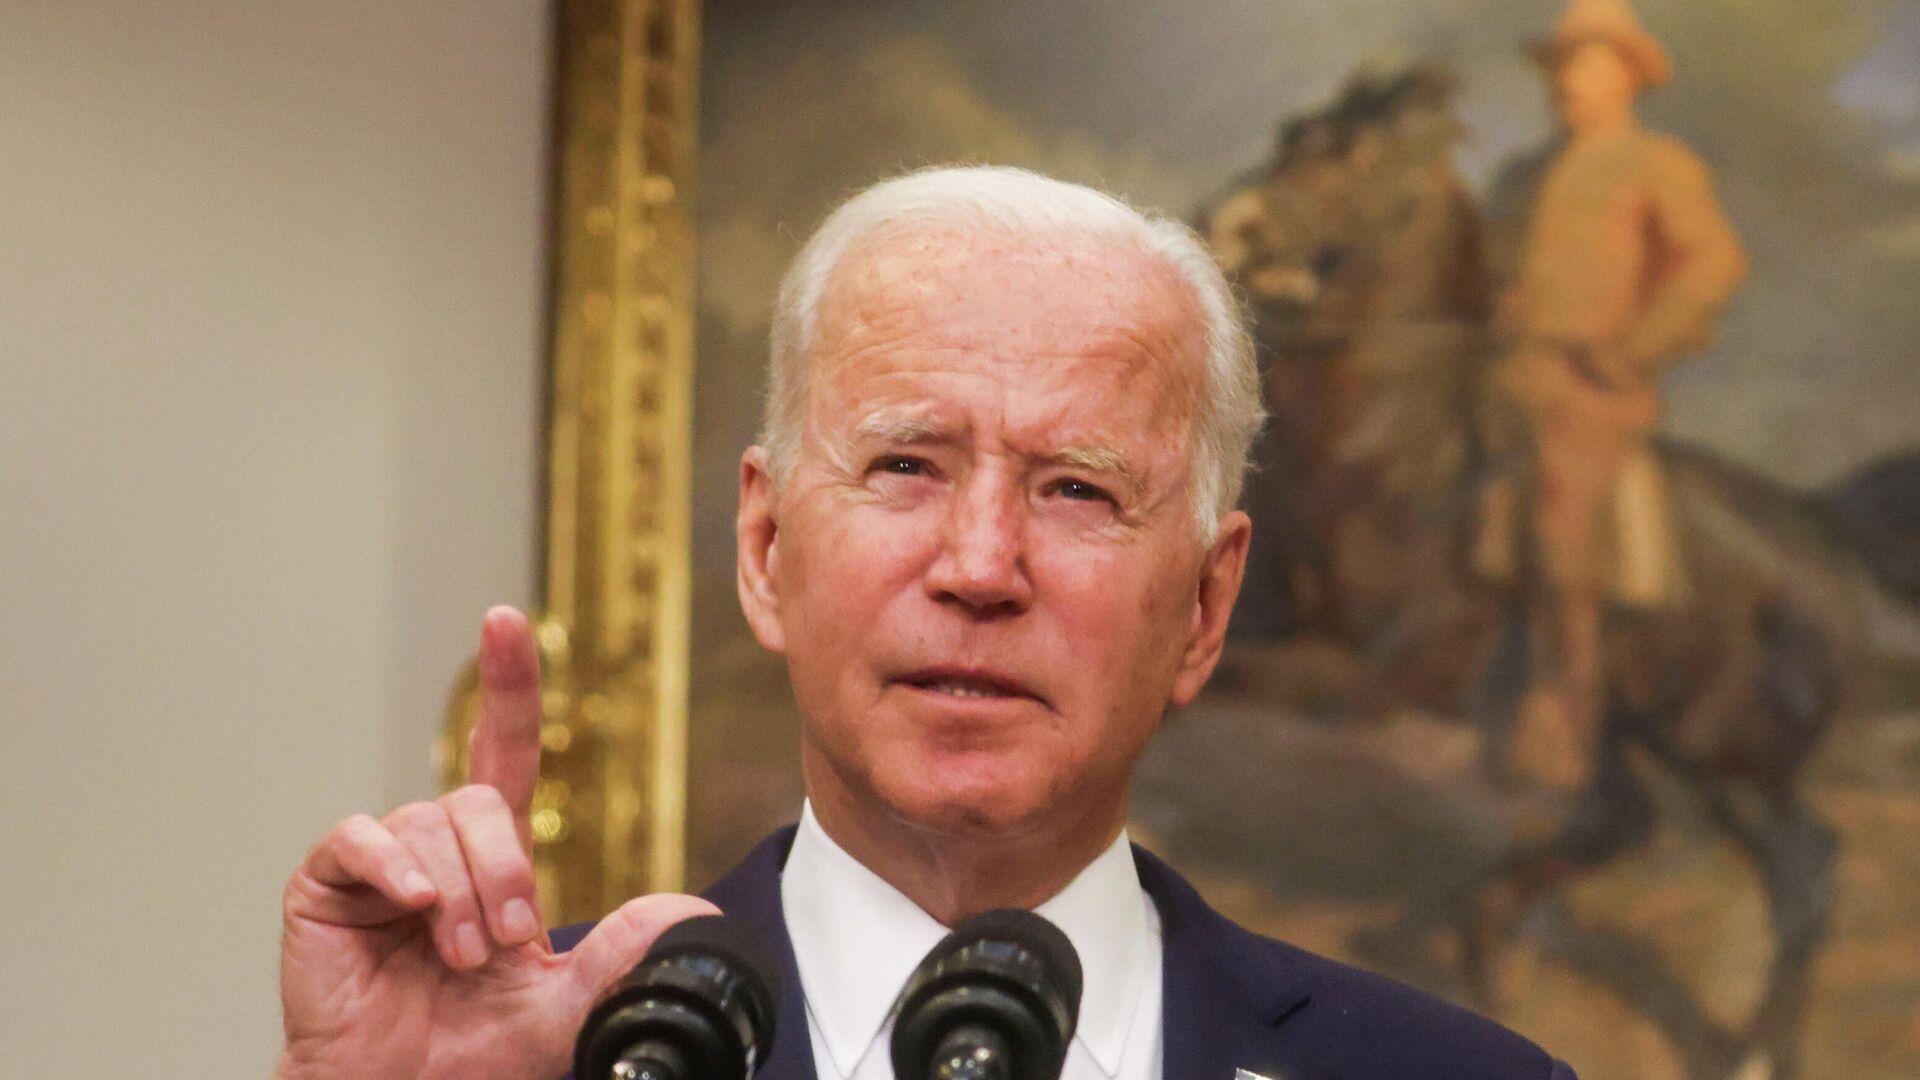 Joe Biden, presidente de EEUU - Sputnik Mundo, 1920, 07.09.2021